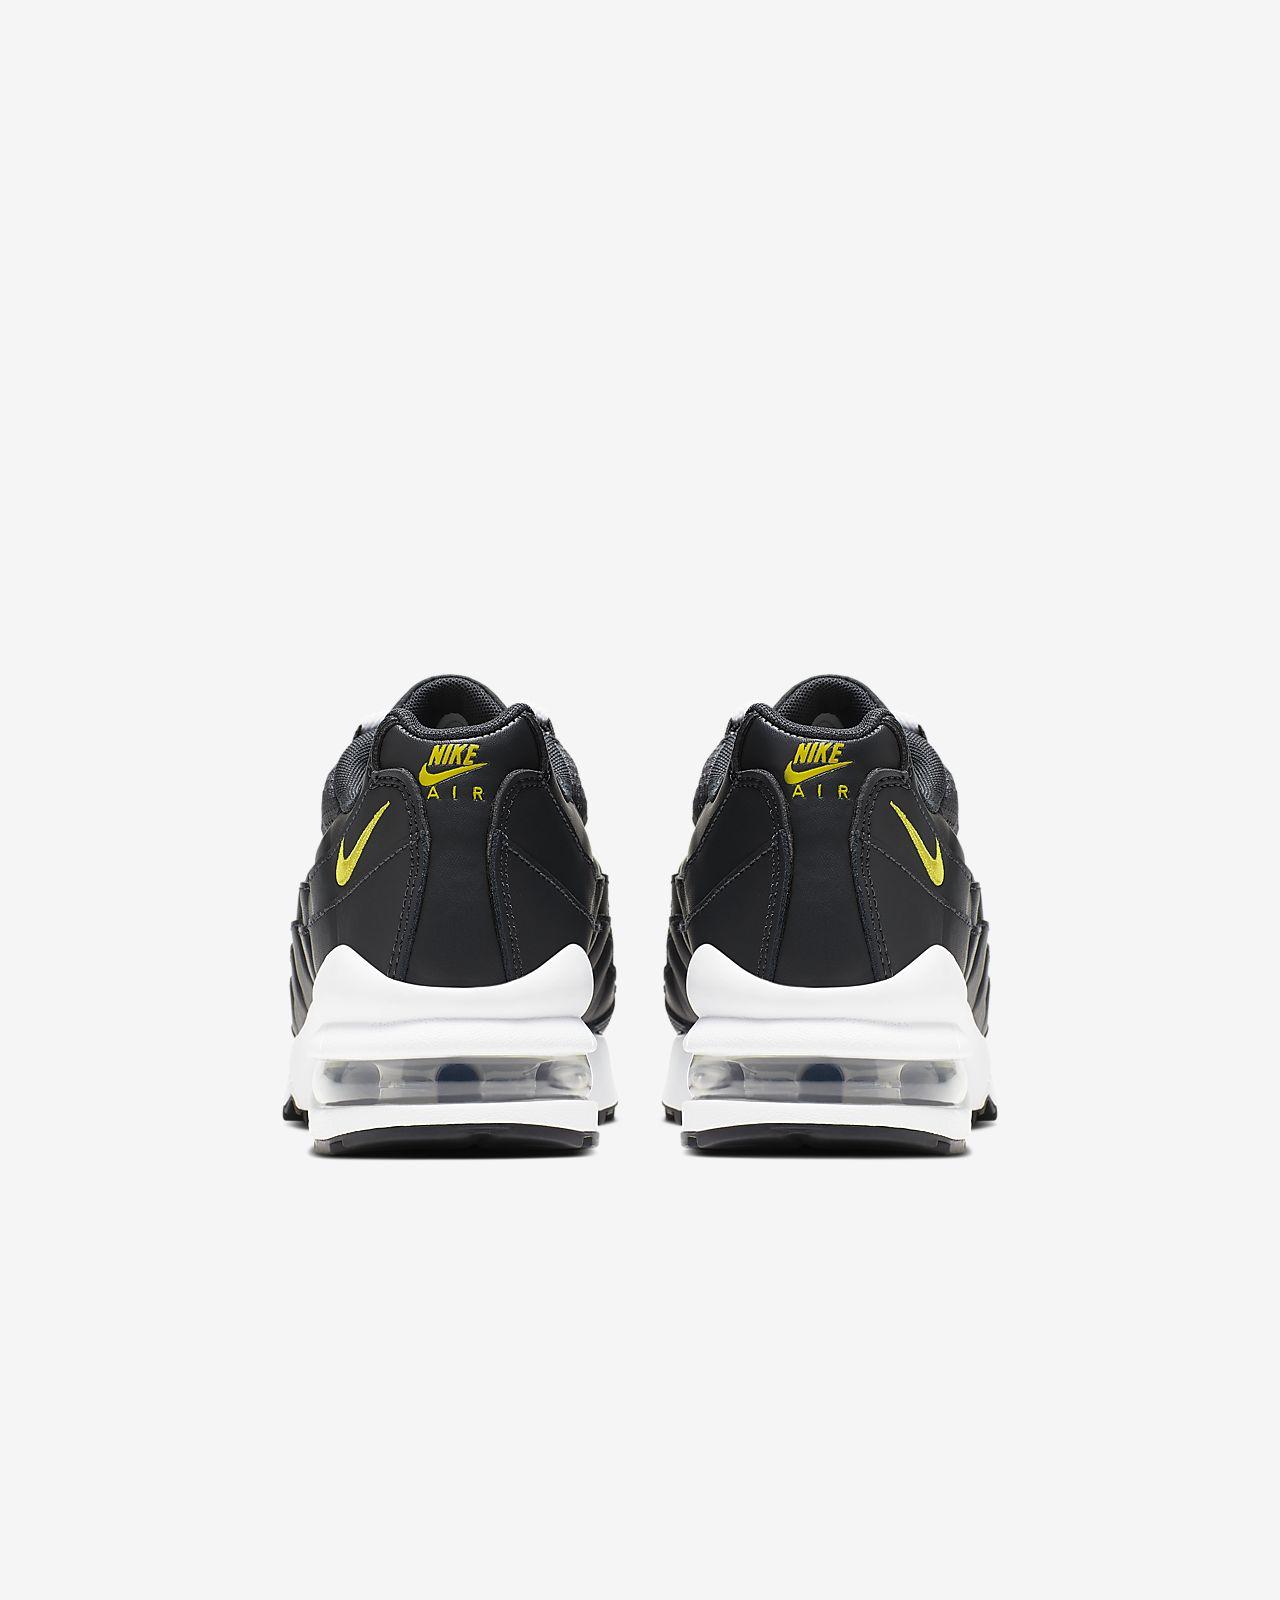 6a56755a0a Nike Air Max 95 Big Kids' Shoe. Nike.com